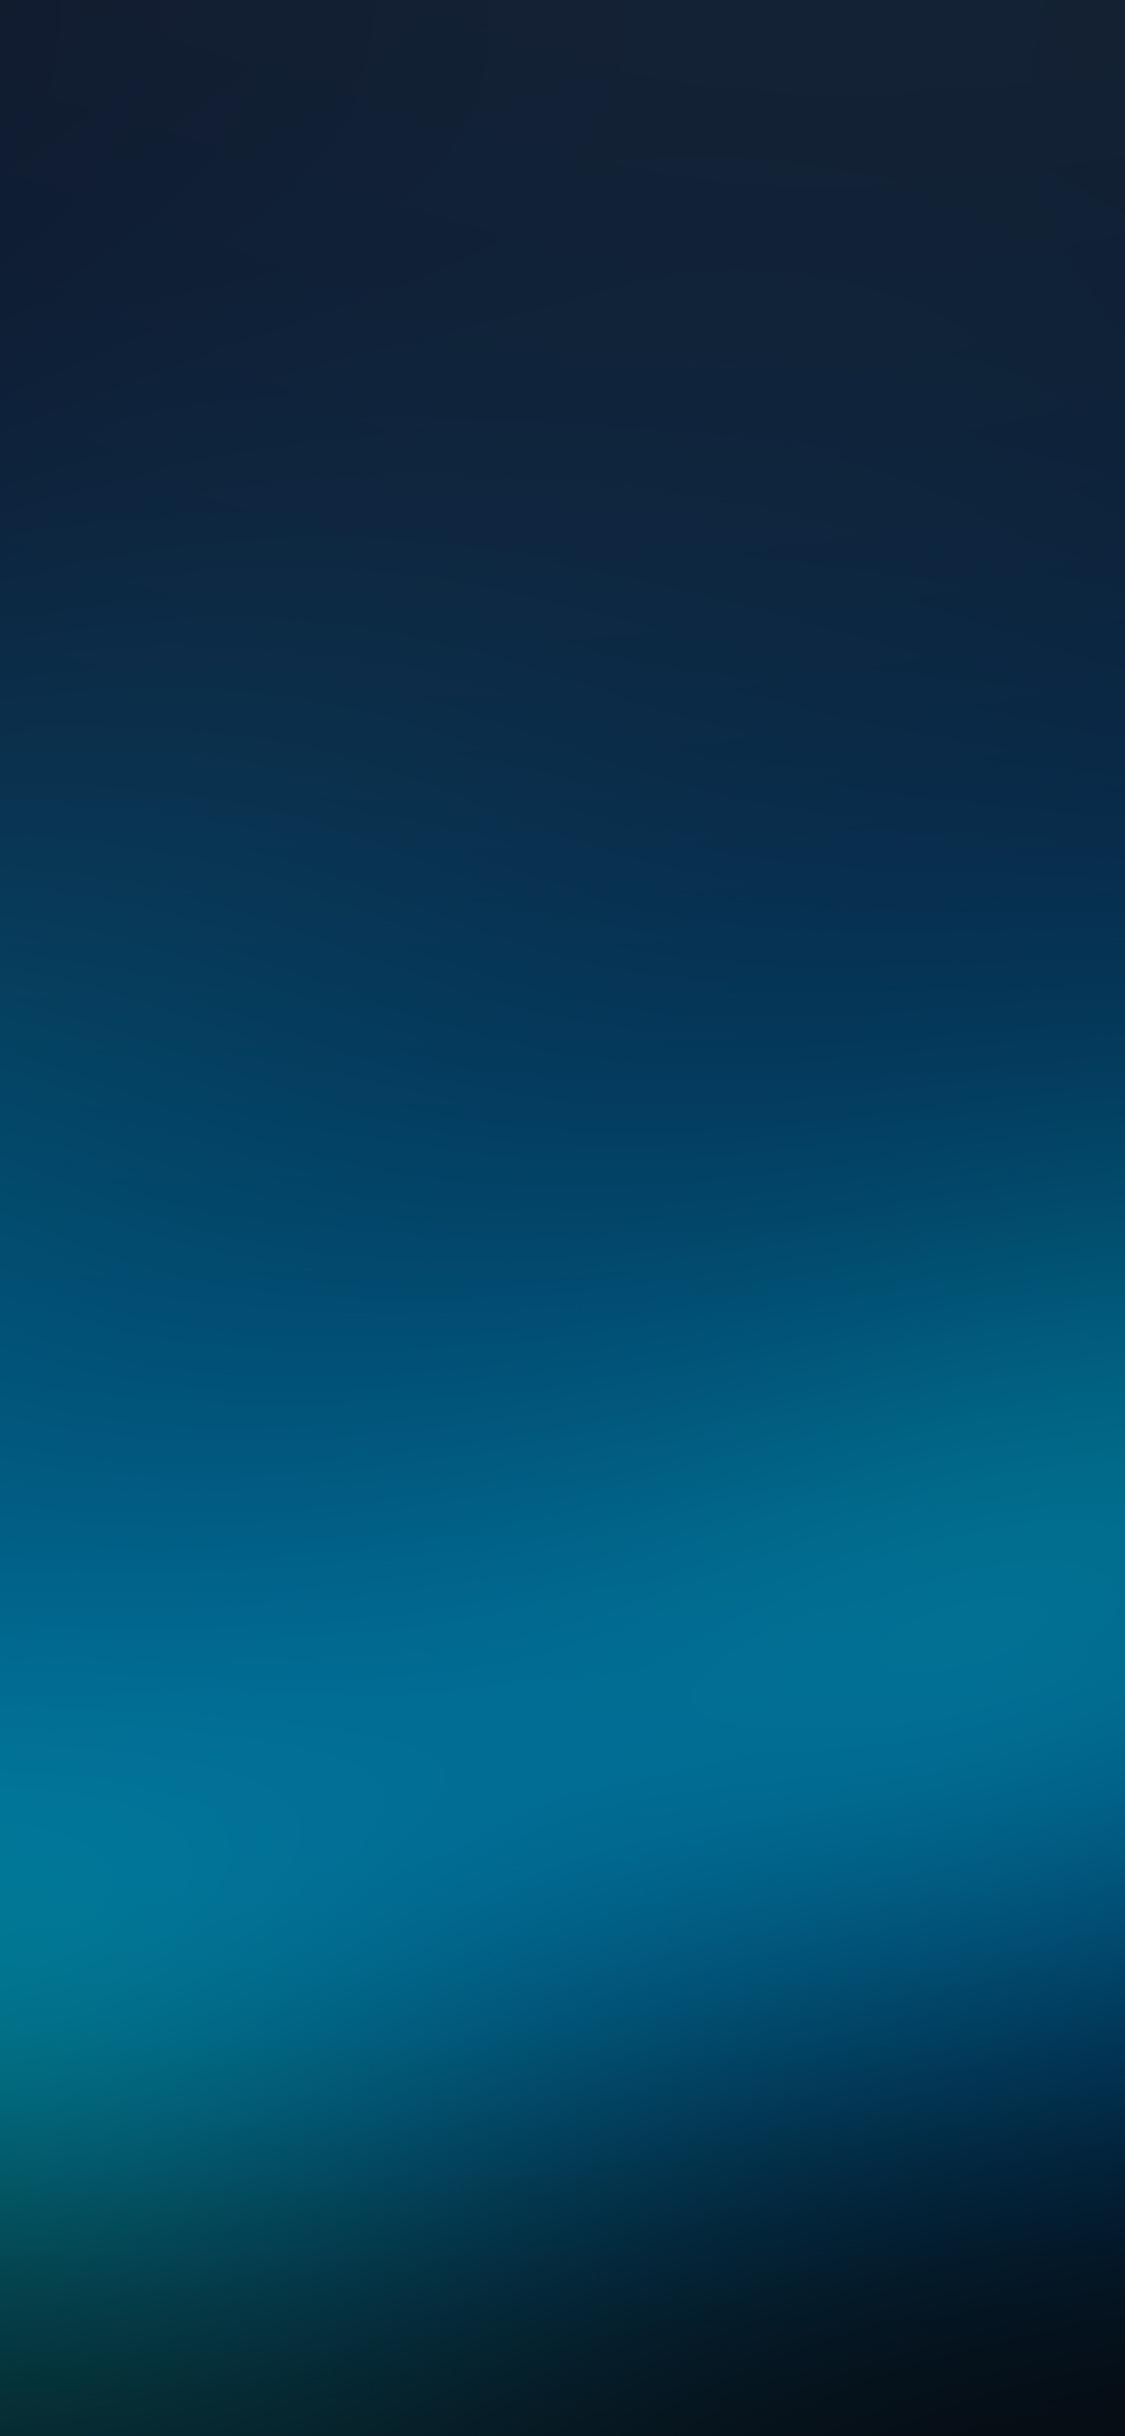 iPhoneXpapers.com-Apple-iPhone-wallpaper-sh00-blue-moon-friday-club-gradation-blur